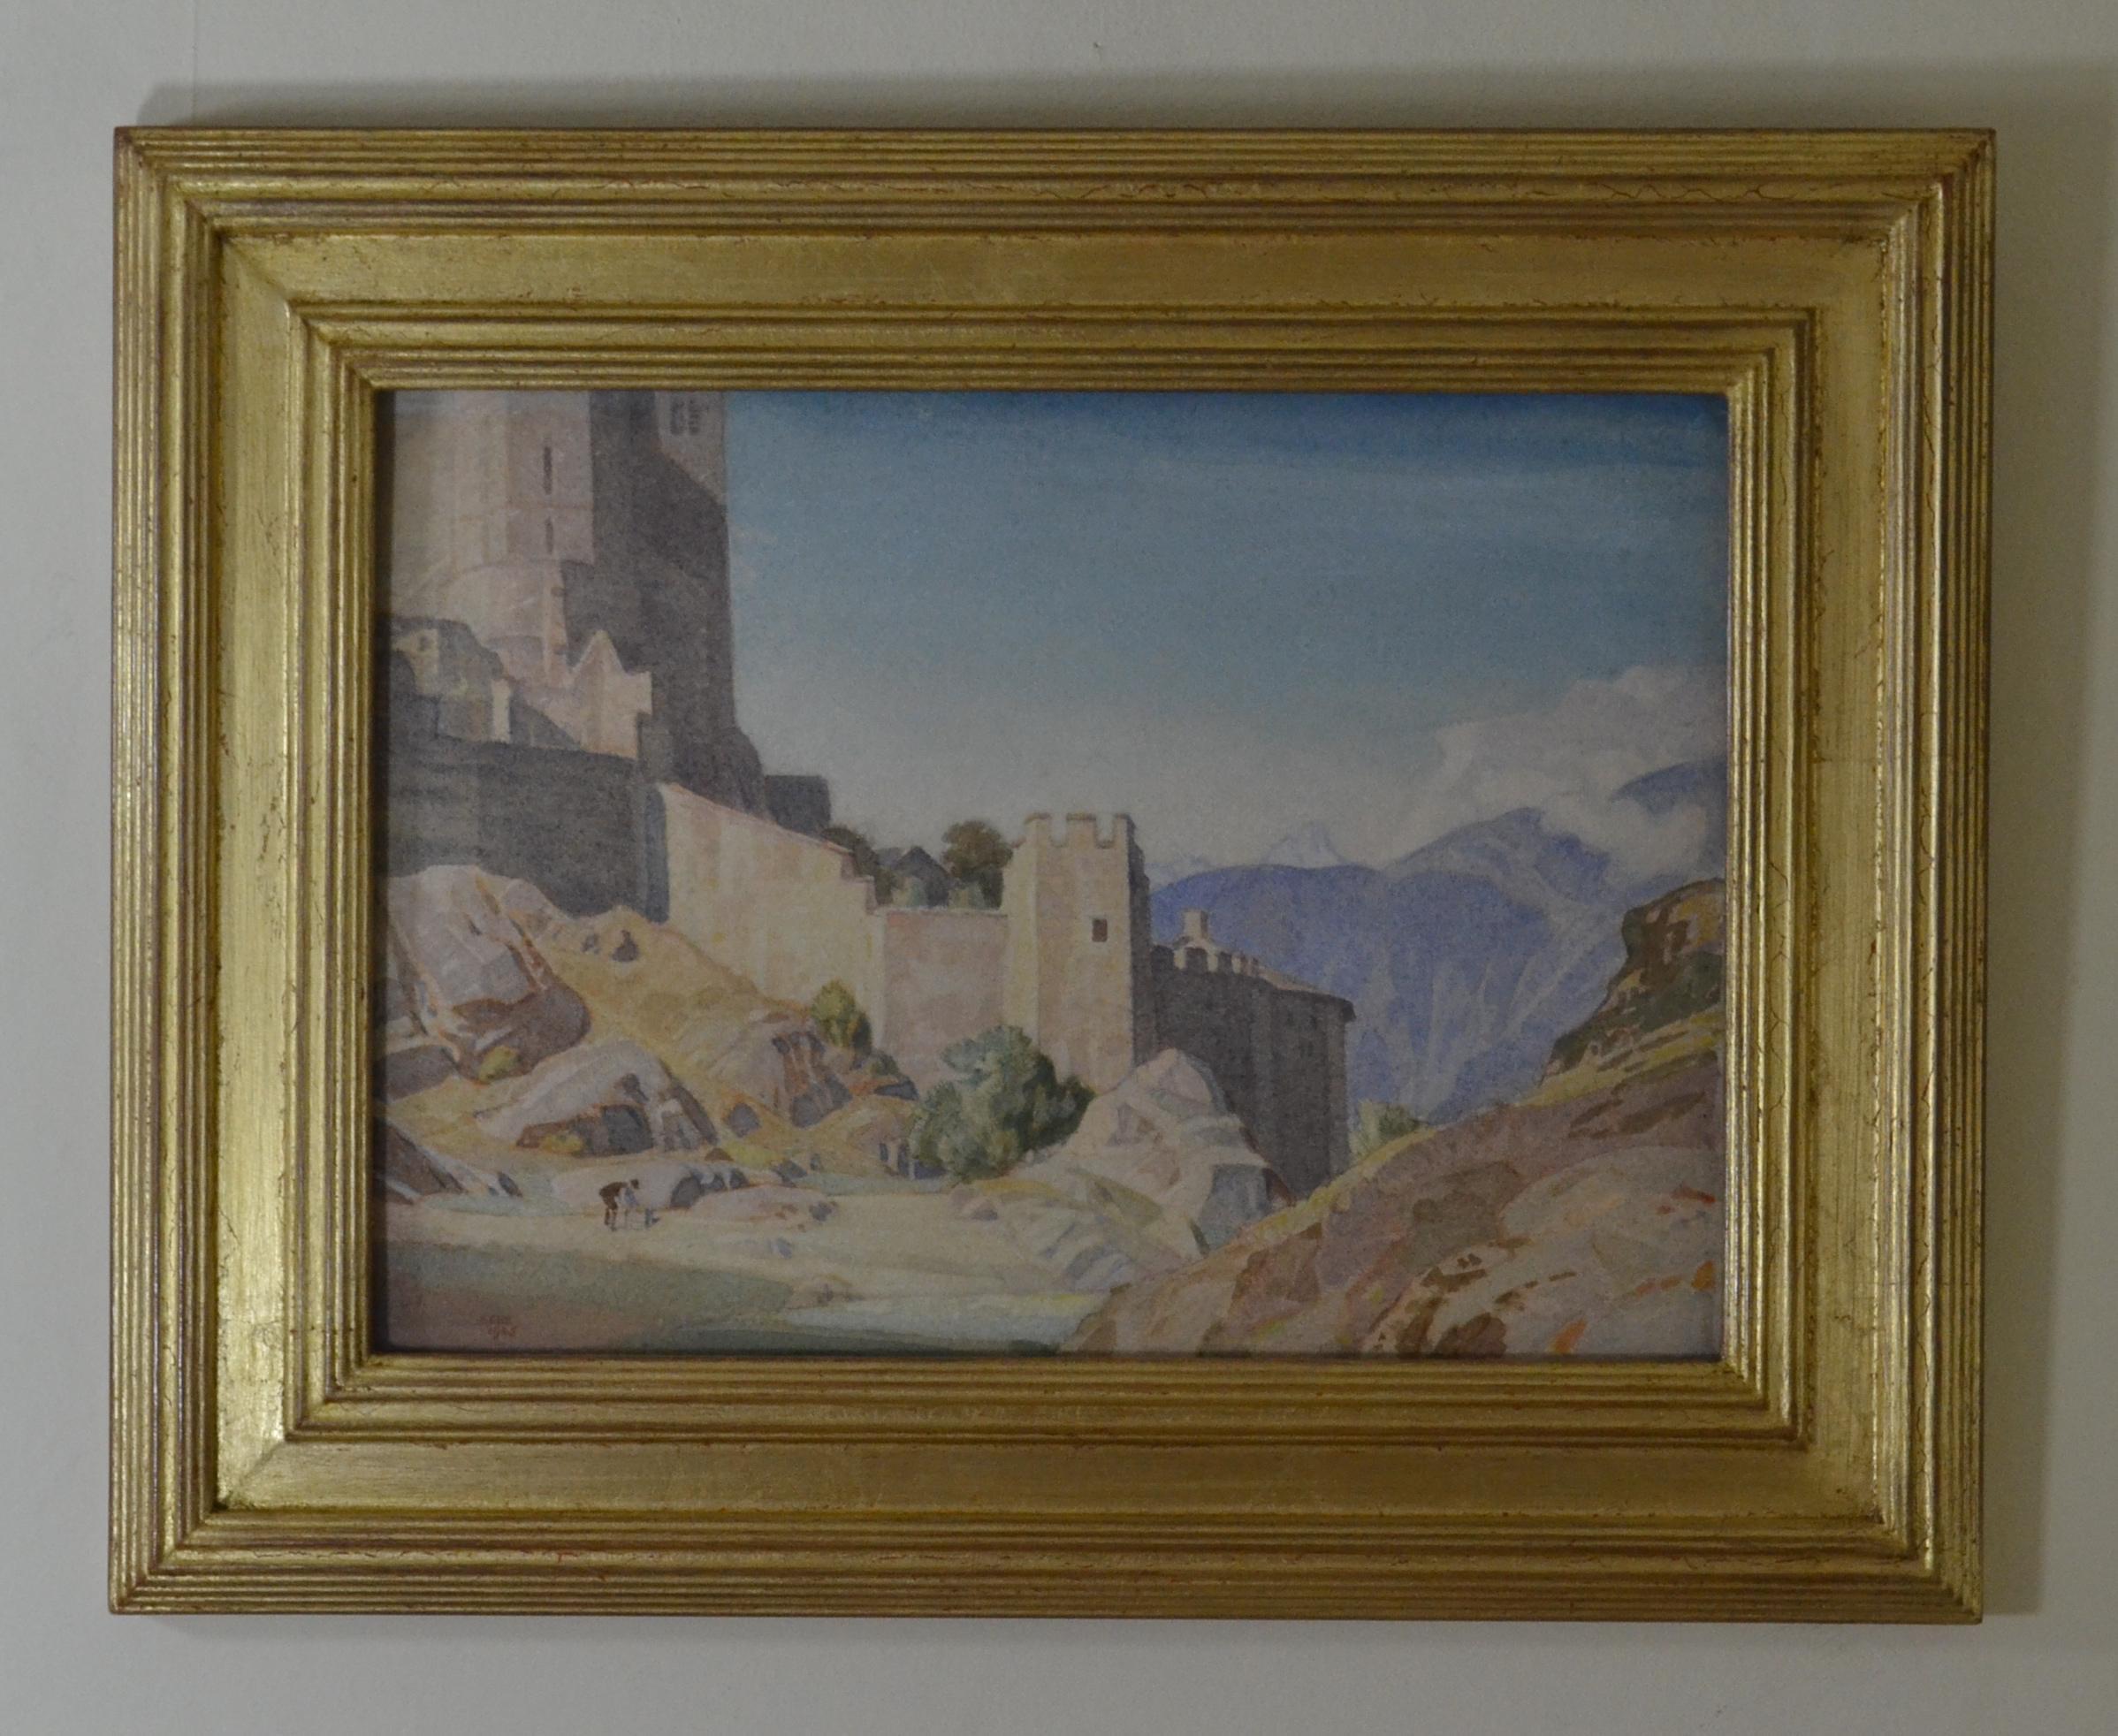 The Castle at Sion - Swiss landscape by British Birmingham Group artist C M Gere